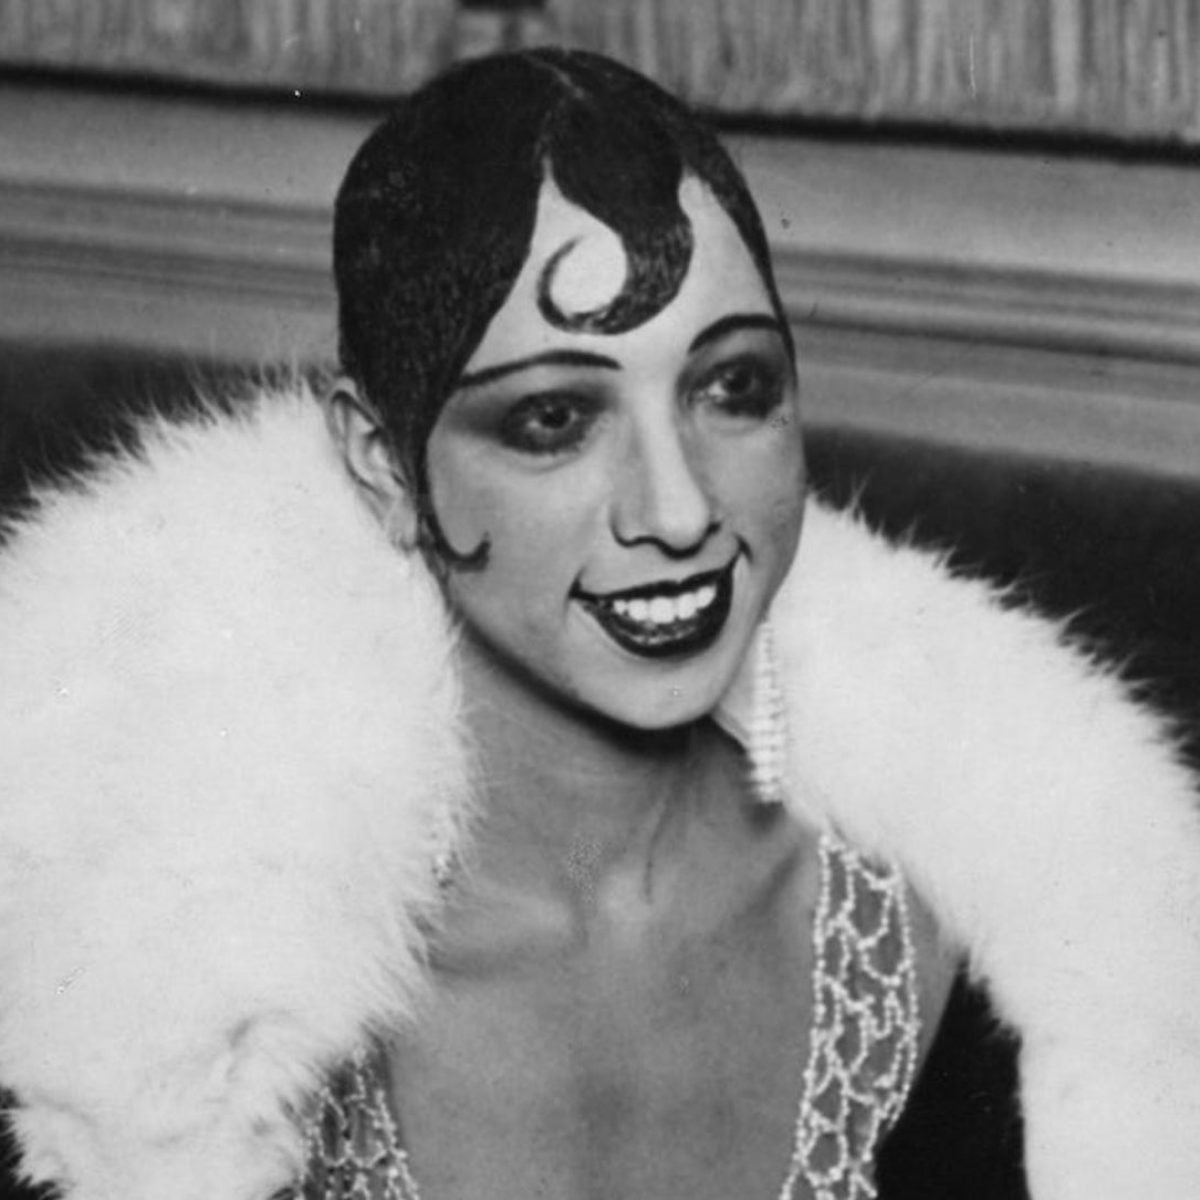 Josephine Baker: Our Dance Beauty Queen